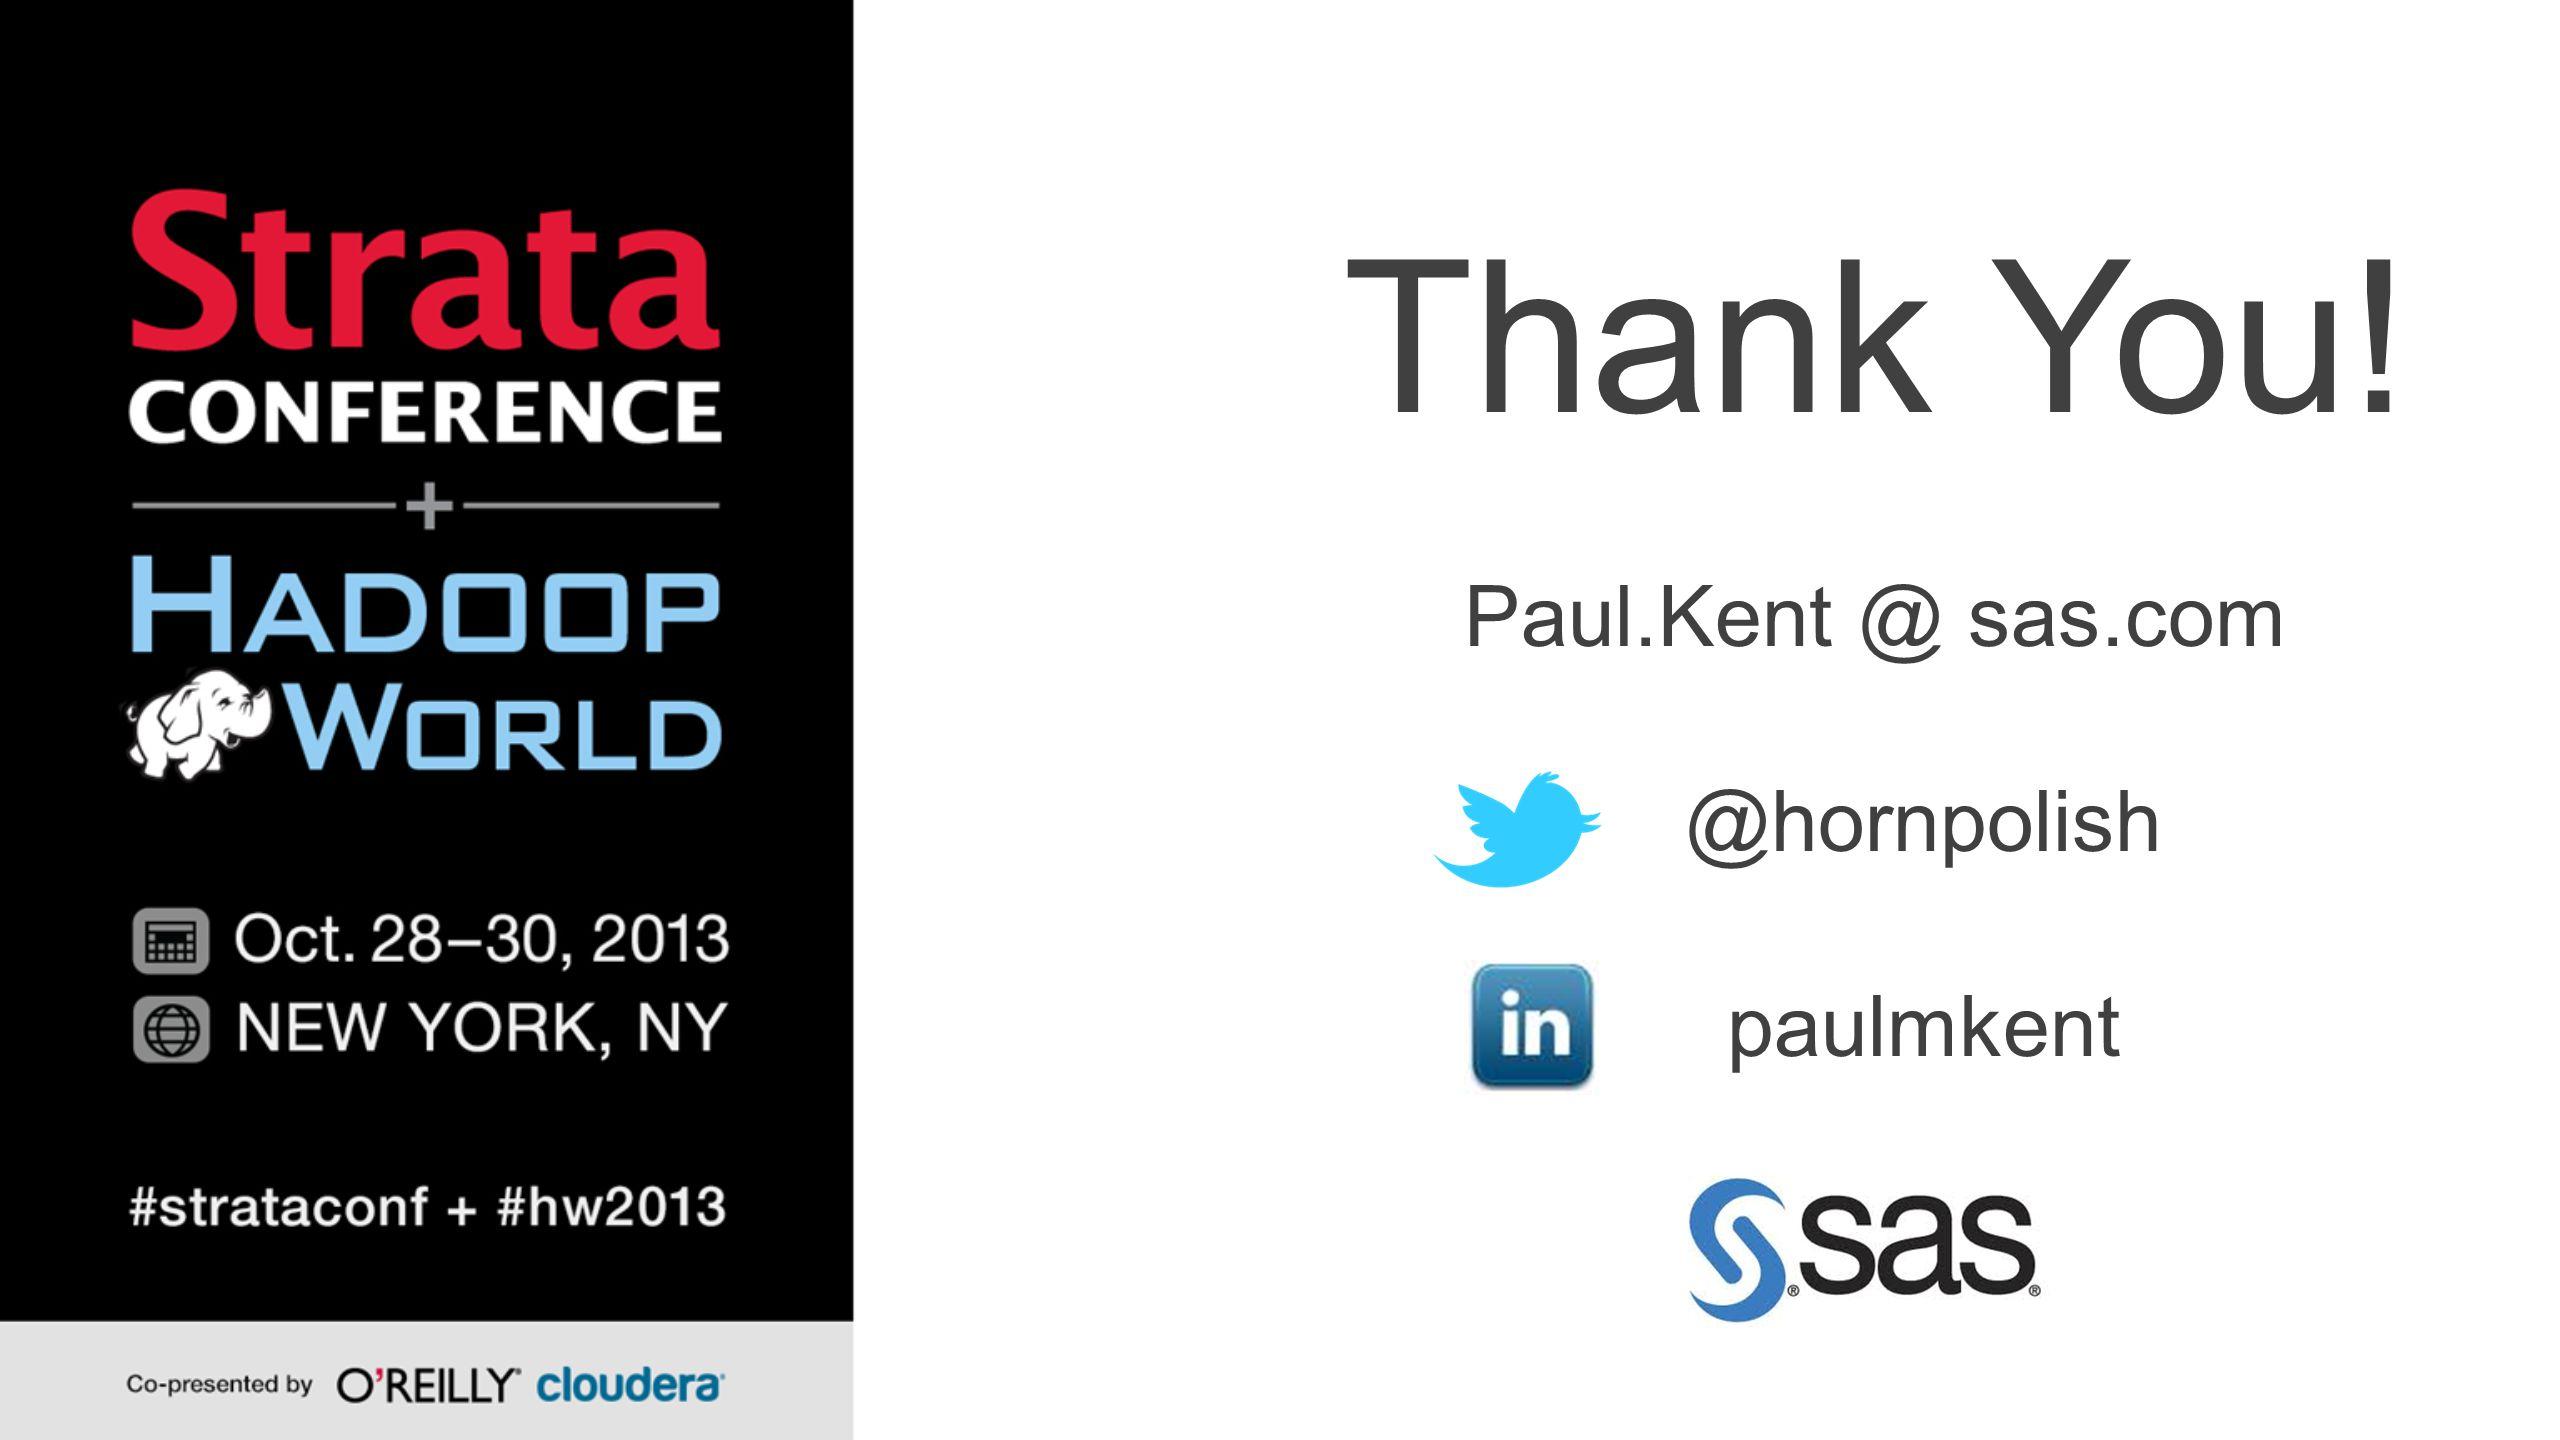 Thank You! Paul.Kent @ sas.com @hornpolish paulmkent